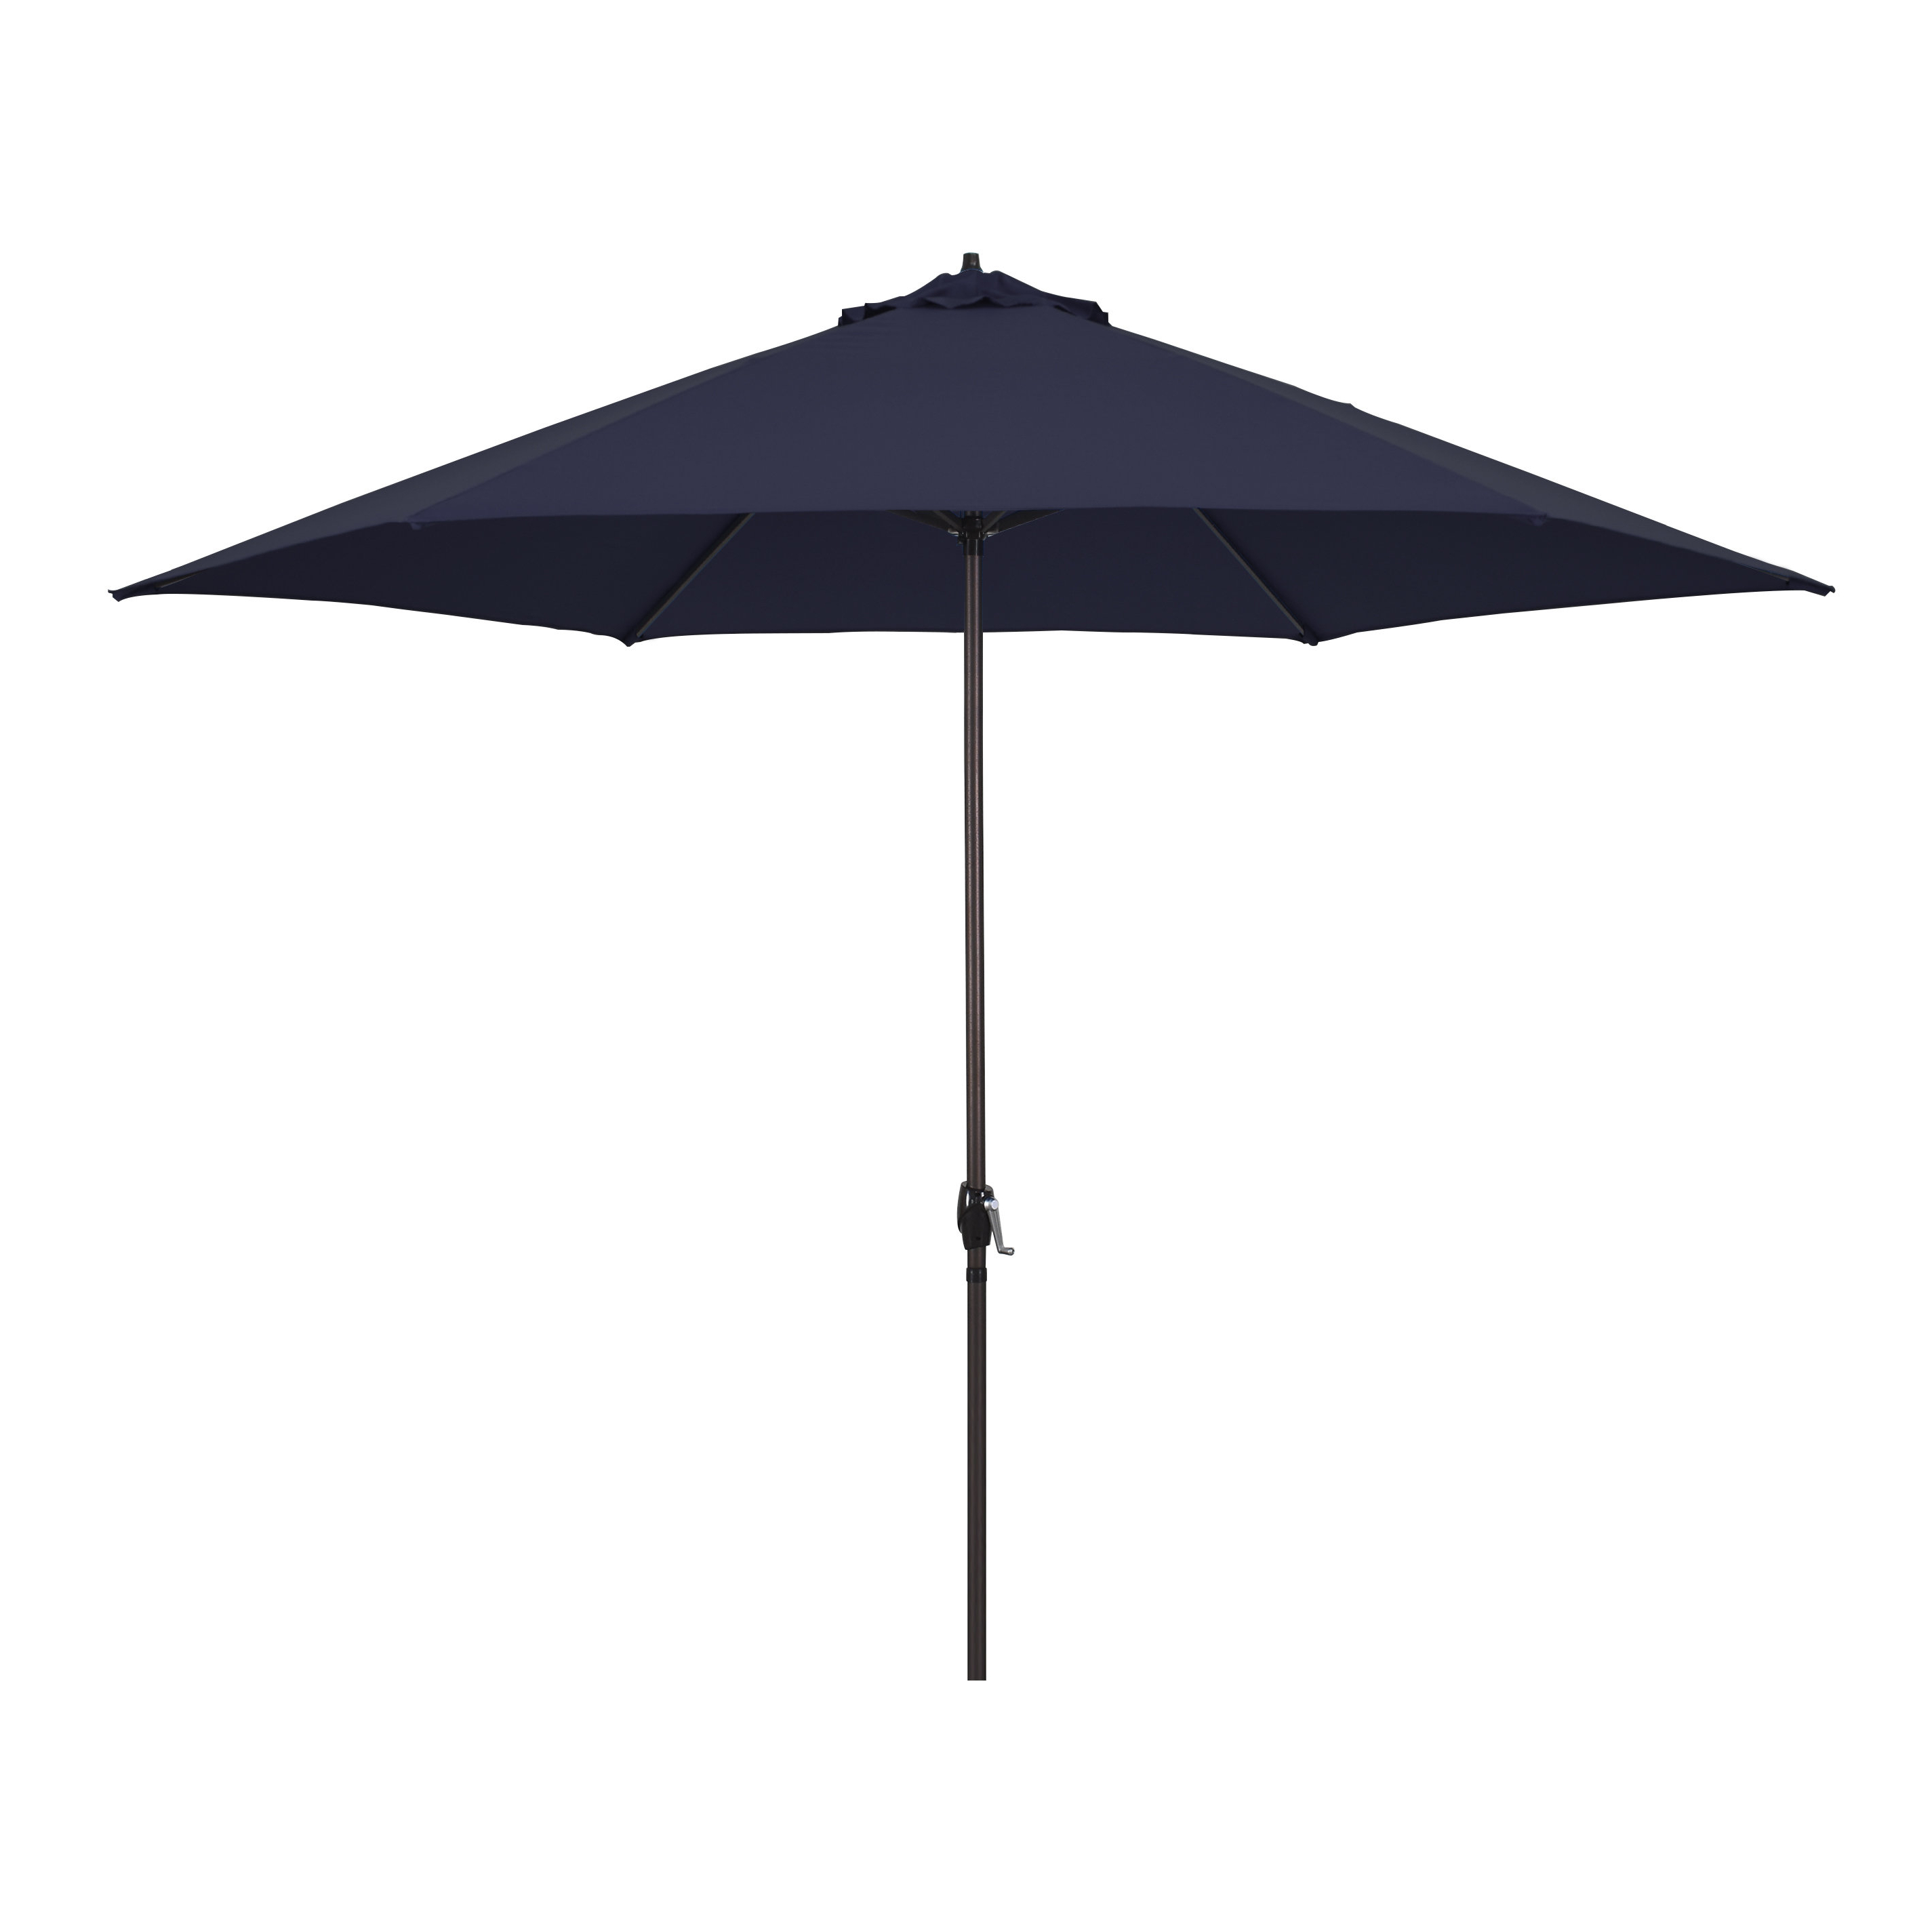 Mcdougal 11' Market Umbrella In Trendy Artrip Market Umbrellas (View 10 of 20)